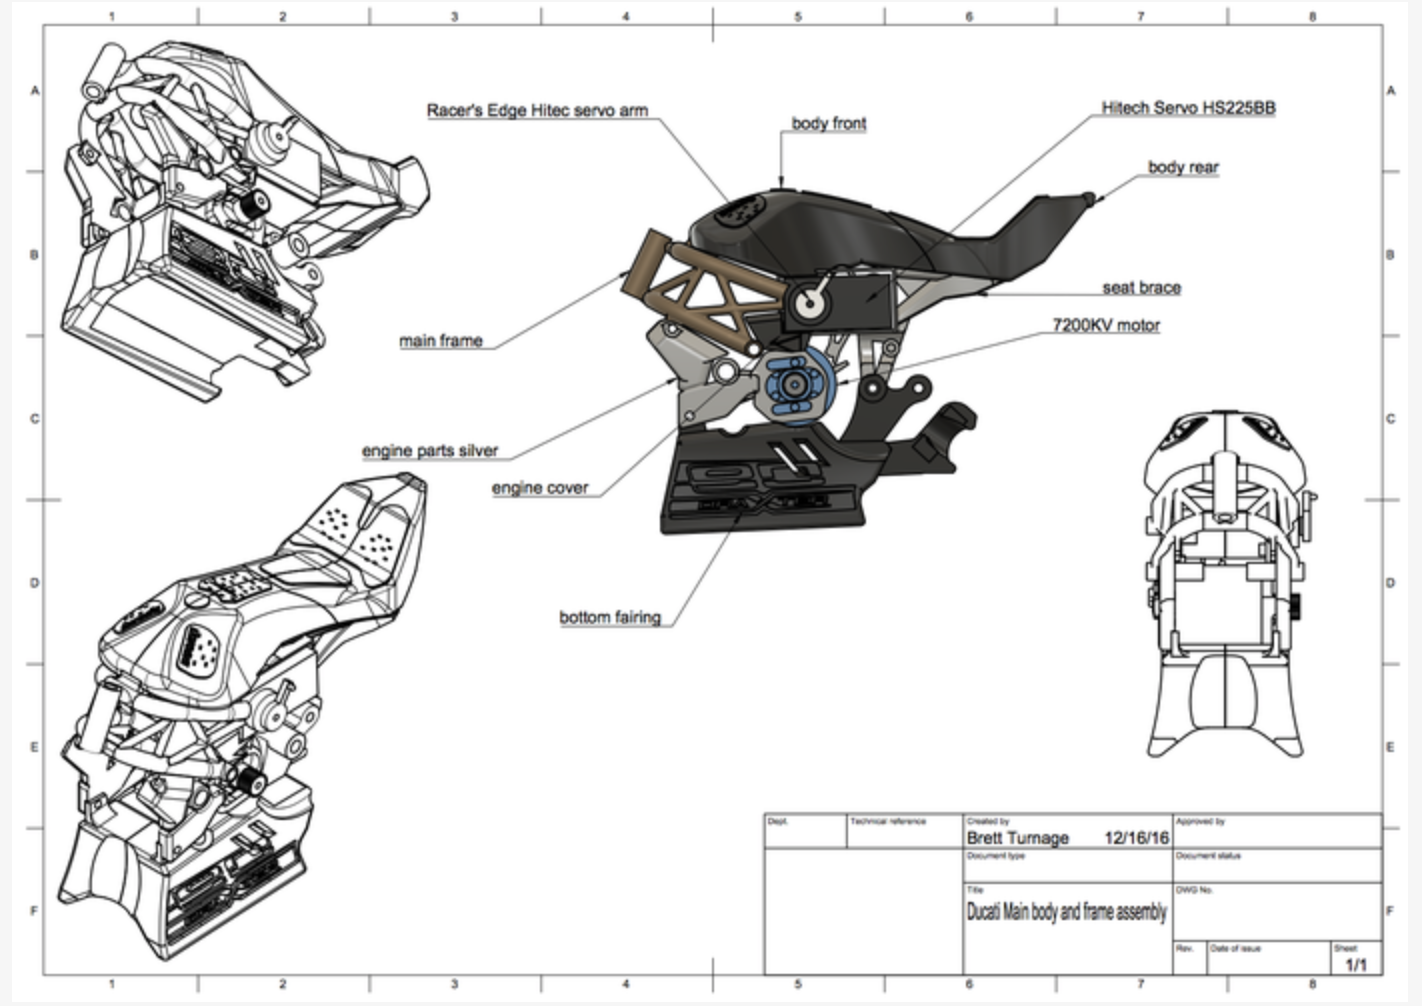 Screen Shot 2017-02-10 at 9.29.17 AM.png Download free STL file 2016 Ducati Draxter Concept Drag Bike RC • 3D printer template, brett